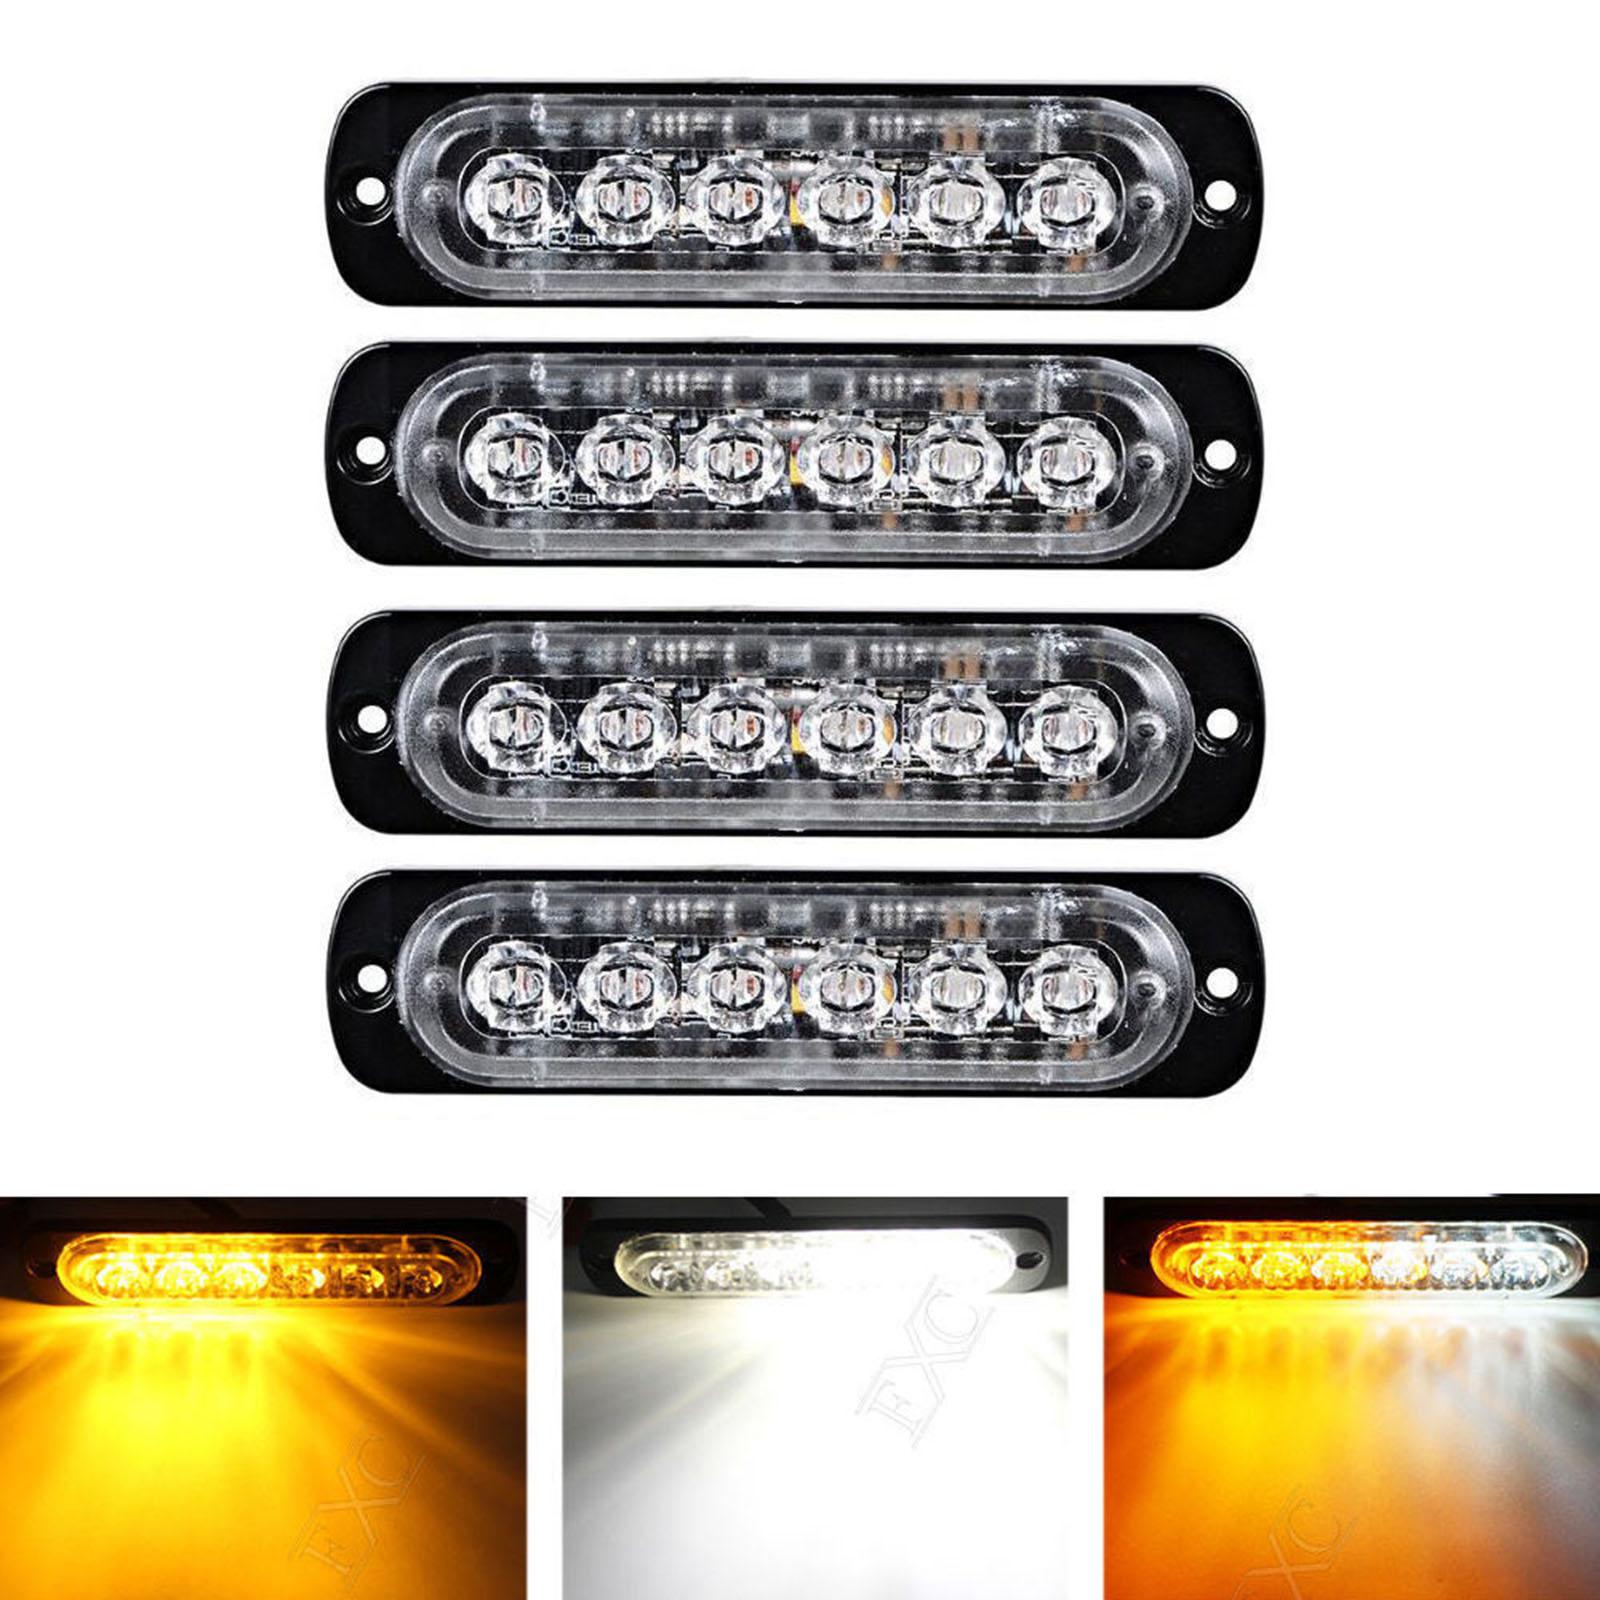 Mayitr 4X Car Truck 6 LED Light Flash Emergency Hazard Warning Amber + White Lamp 18W with Screws